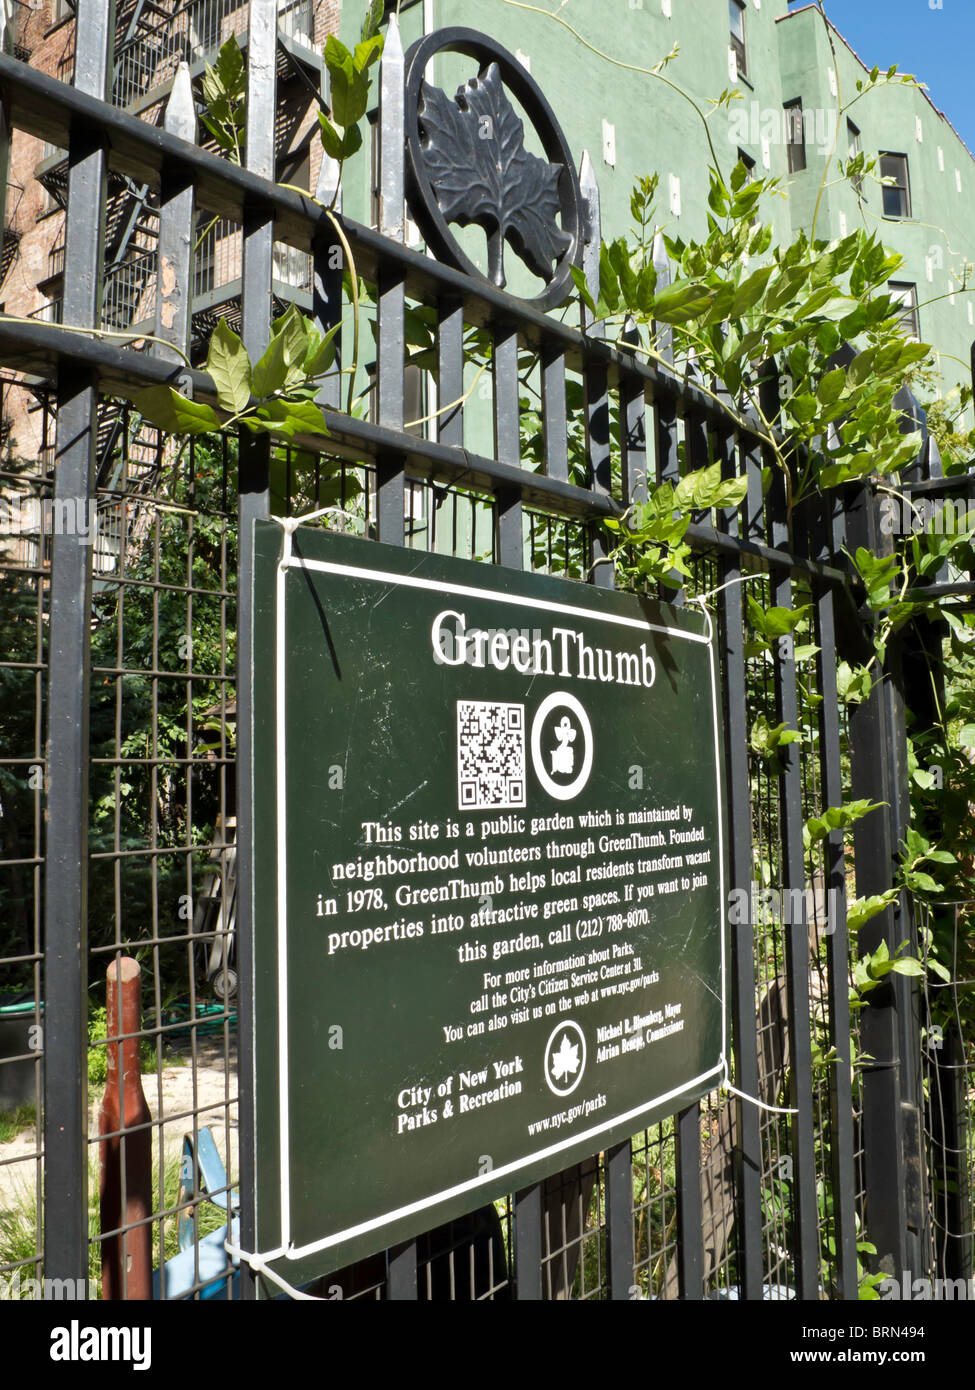 Green Thumb Urban Garden, NYC Stock Photo: 31811840 - Alamy